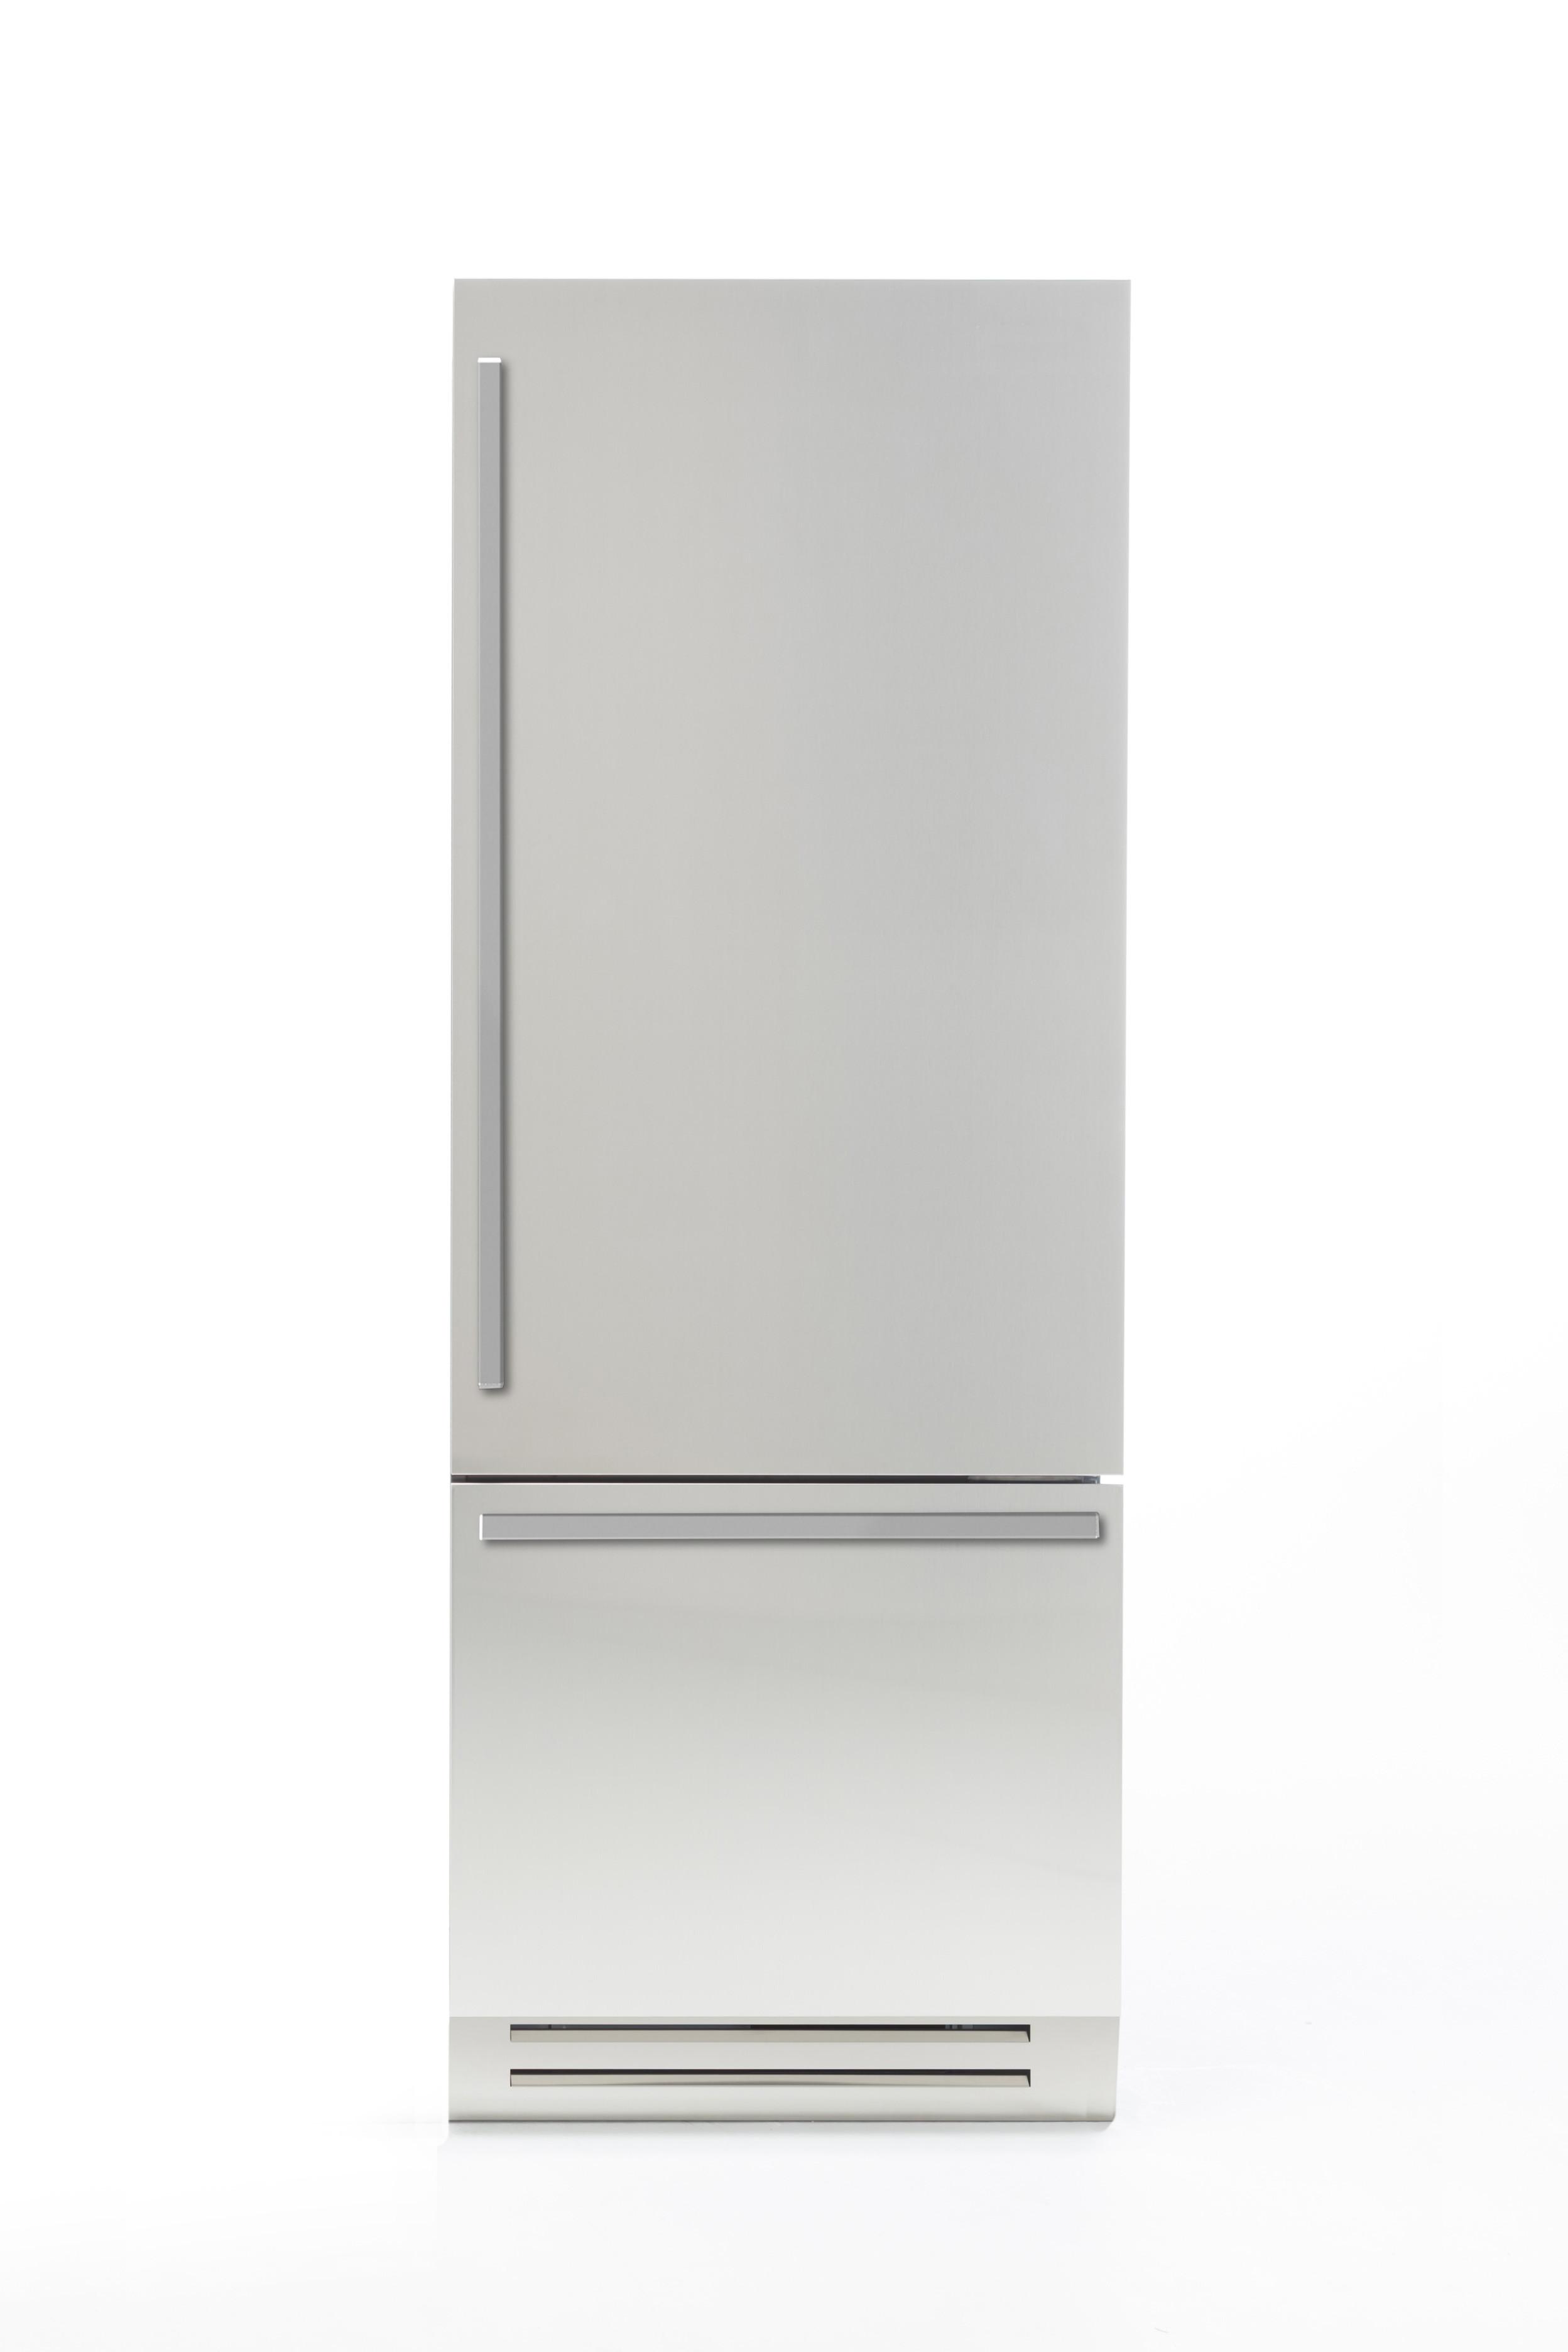 door s built inch in with bi drawers french refrigerators refrigerator lansdale stainless sub th dark all zeros zero kitchen freezer